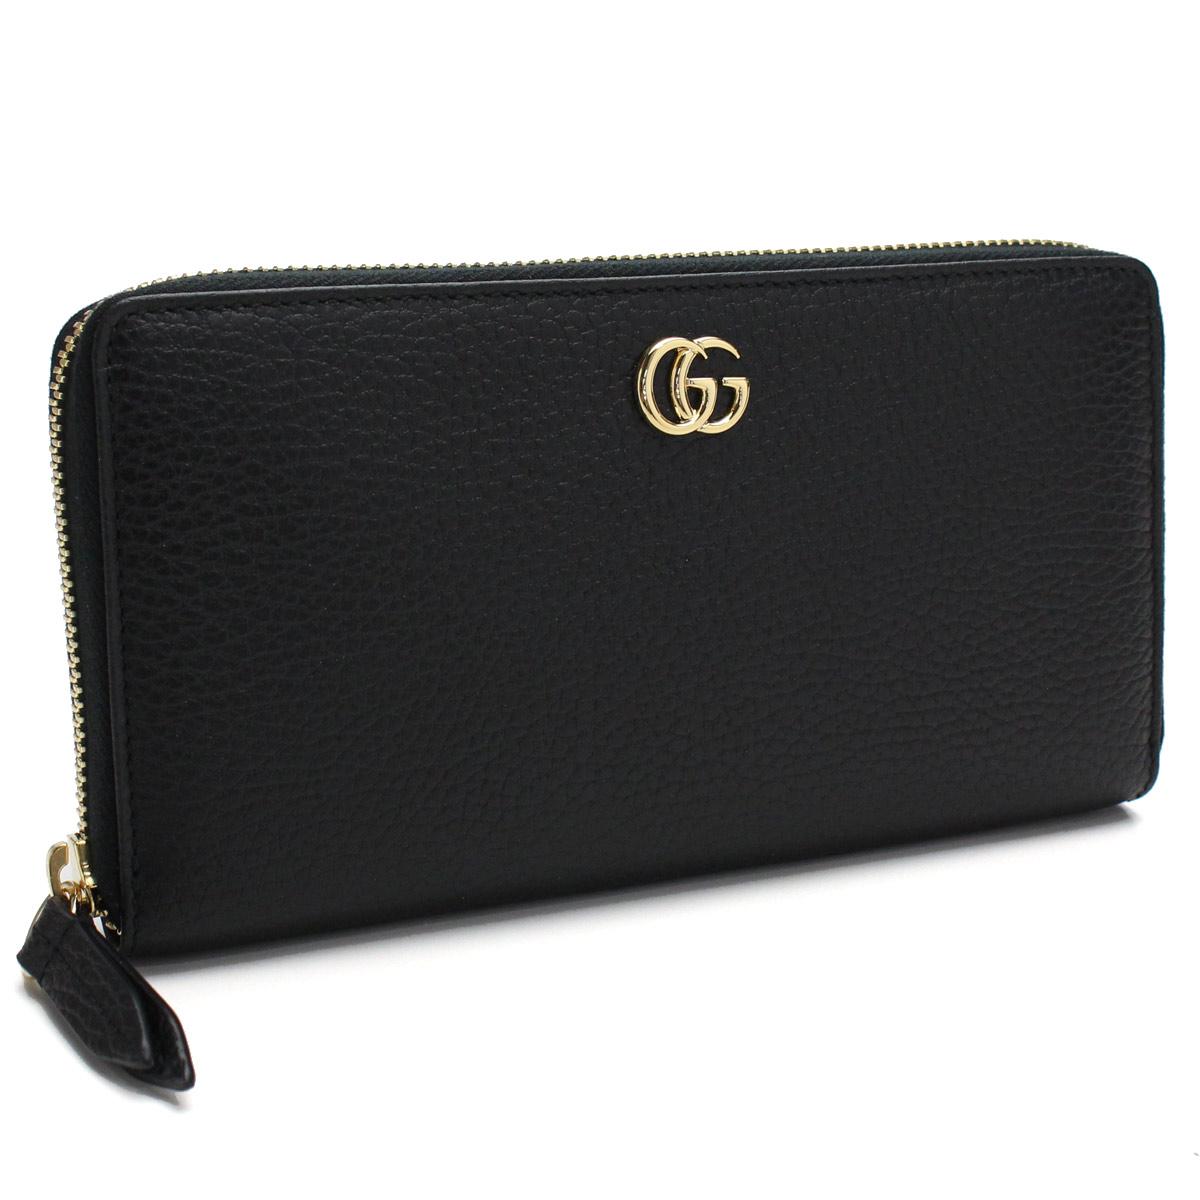 c08b20815 Bighit The total brand wholesale: Gucci GUCCI wallet PETITE round fastener  long wallet 456117 CAO0G 1000 black | Rakuten Global Market